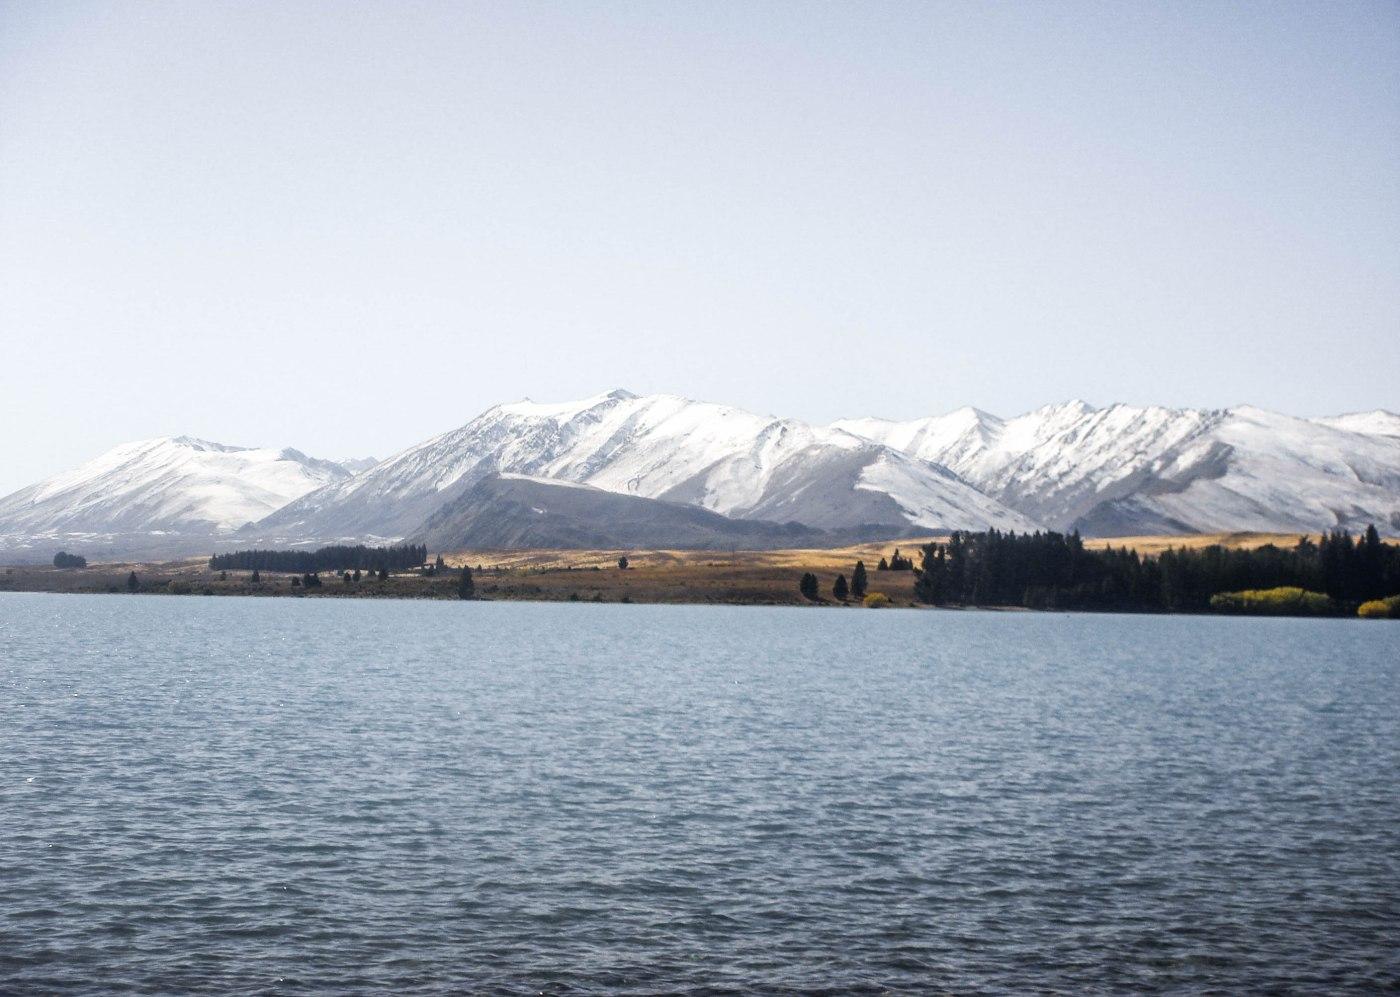 Lakes and waterfalls around New Zealand